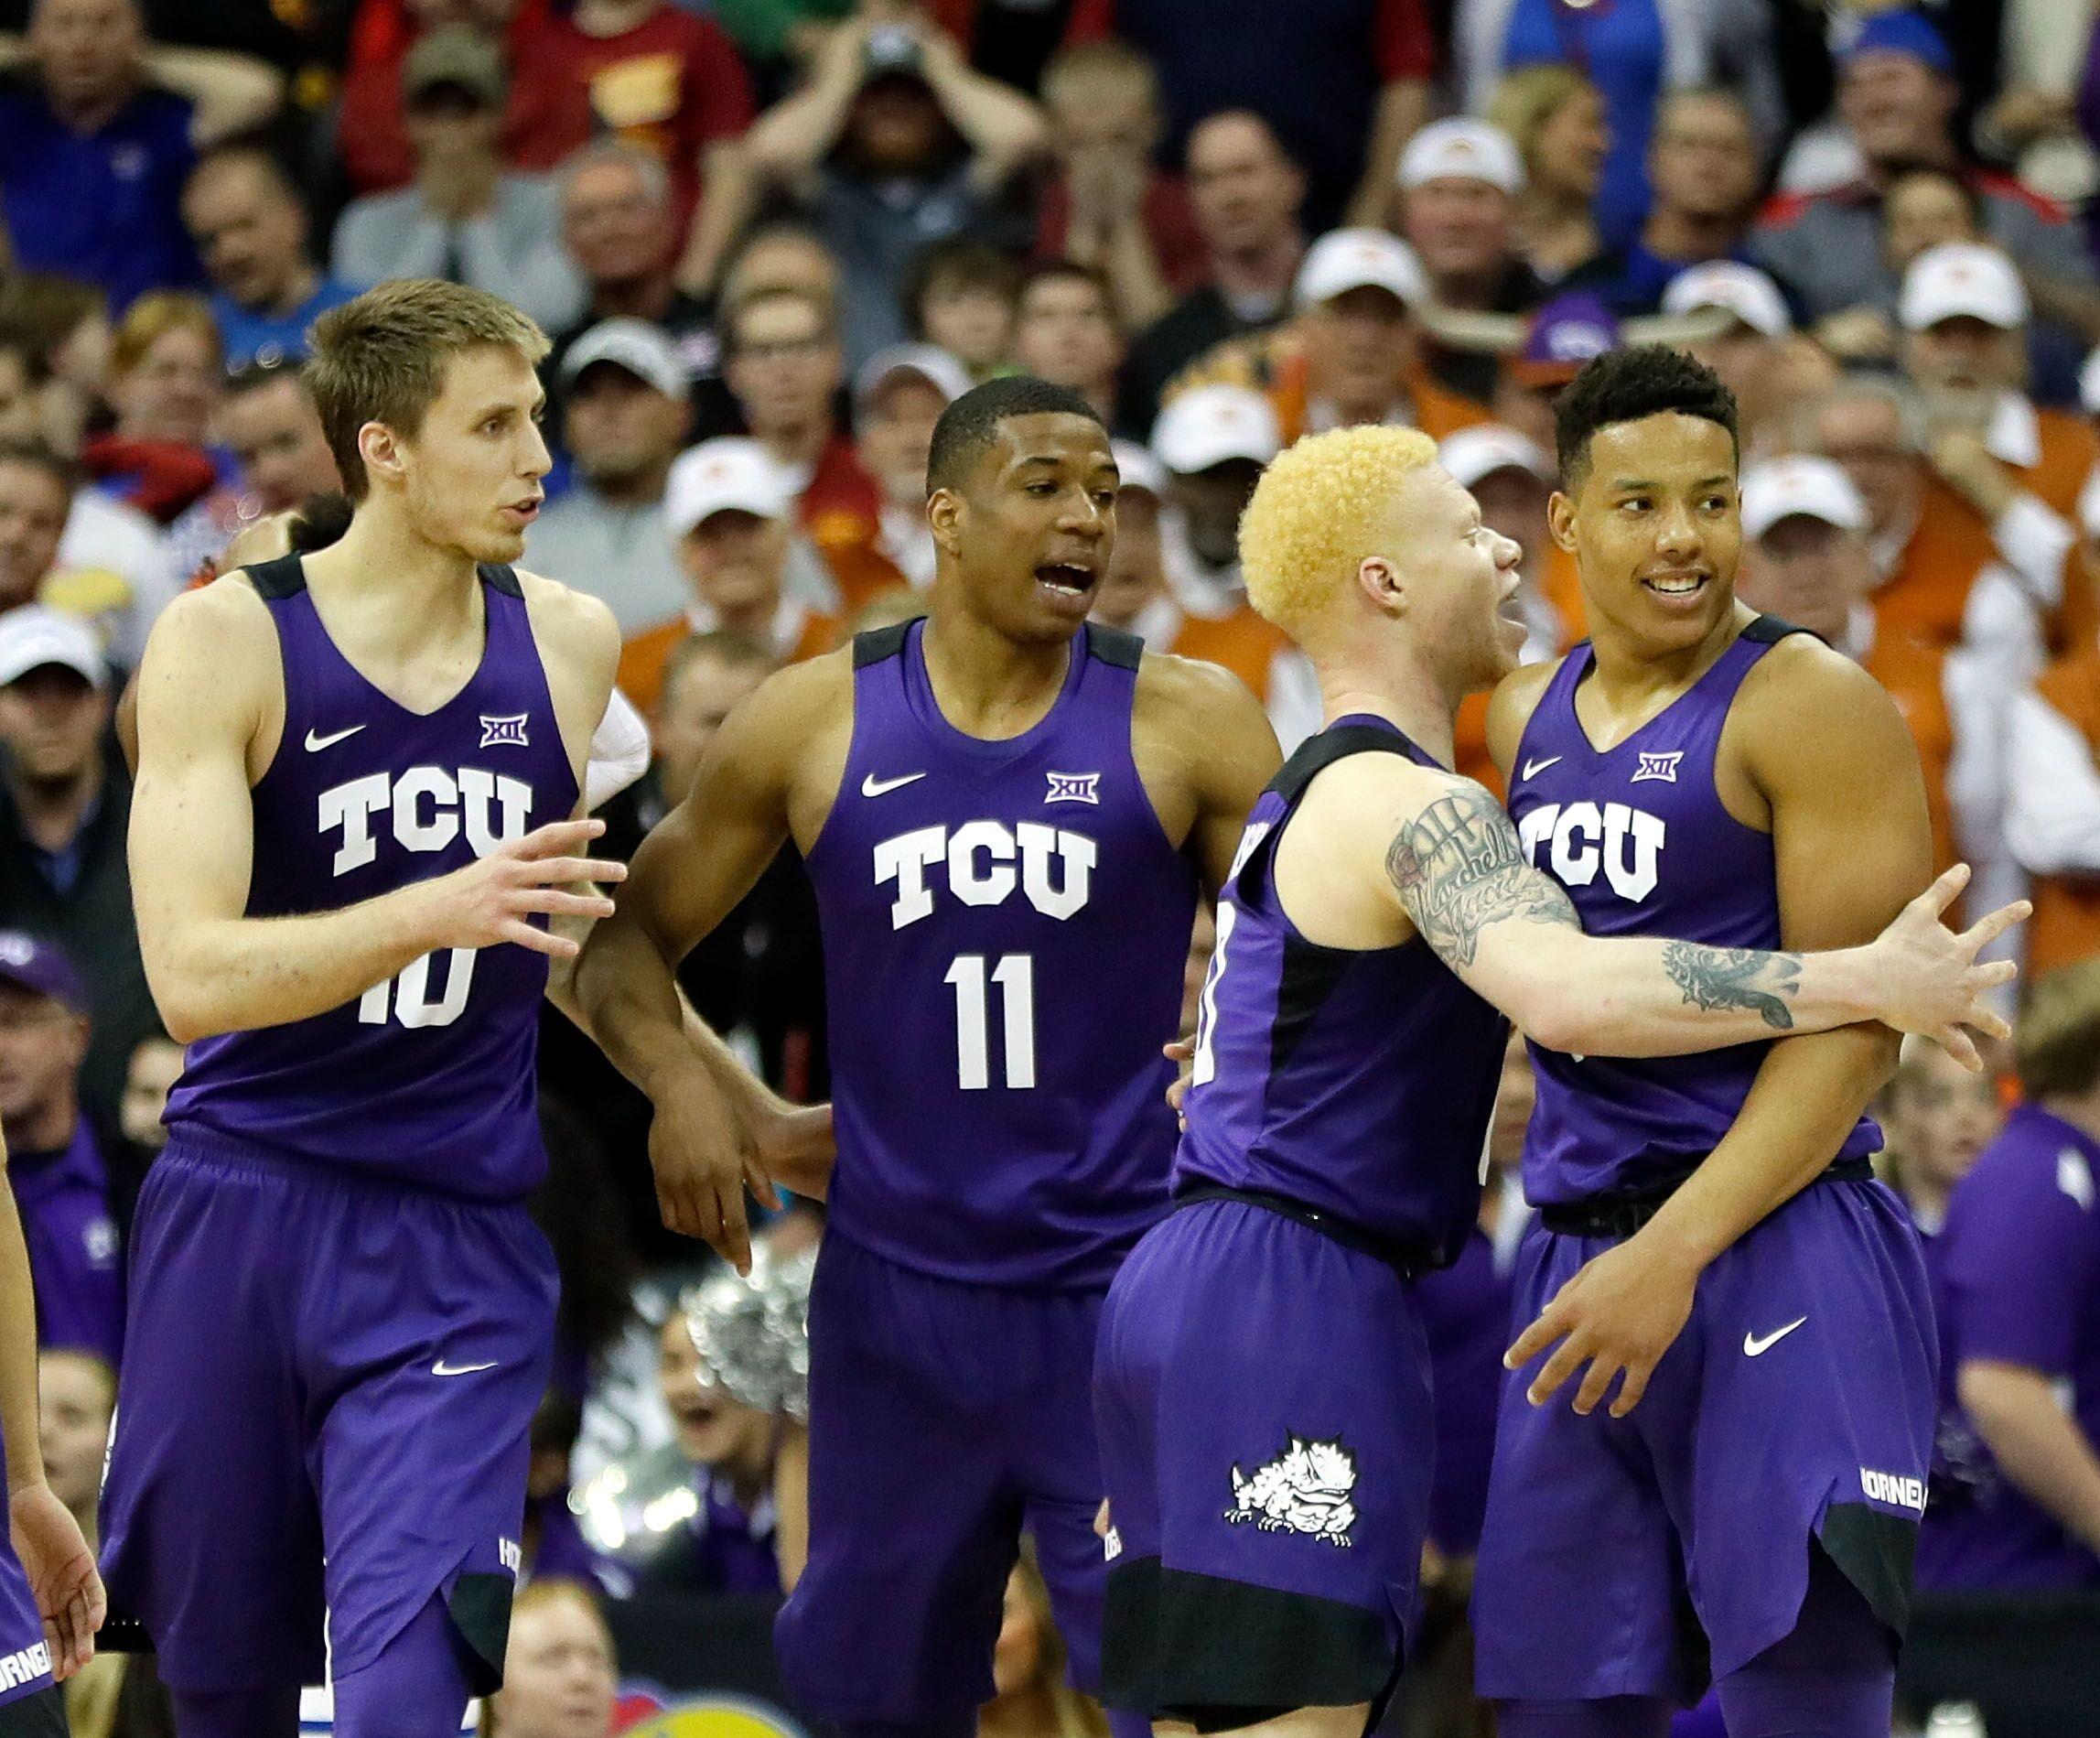 80501e82a20 TCU Basketball: 2018-19 season preview for the Hornfrogs - Page 2